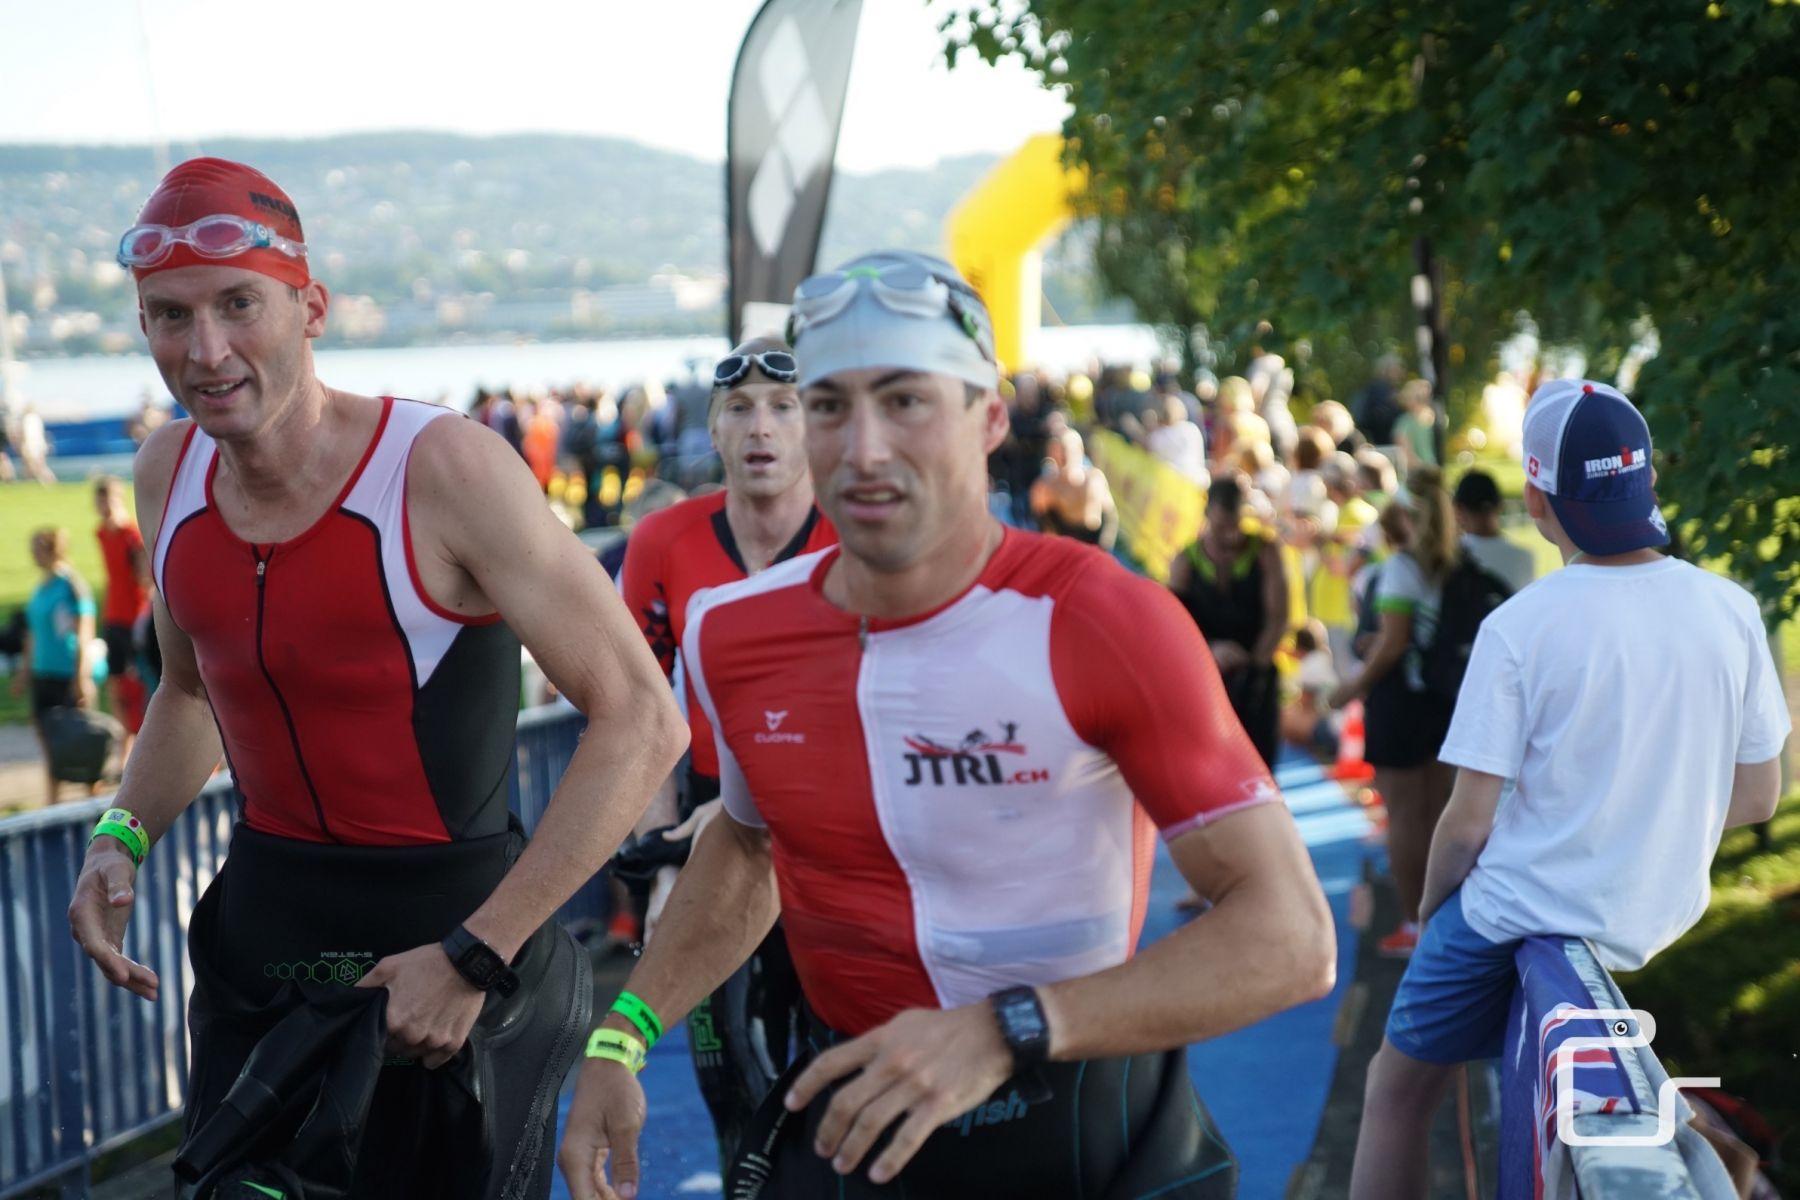 pls24.ch-Ironman-Zuerich-2017-DSC96